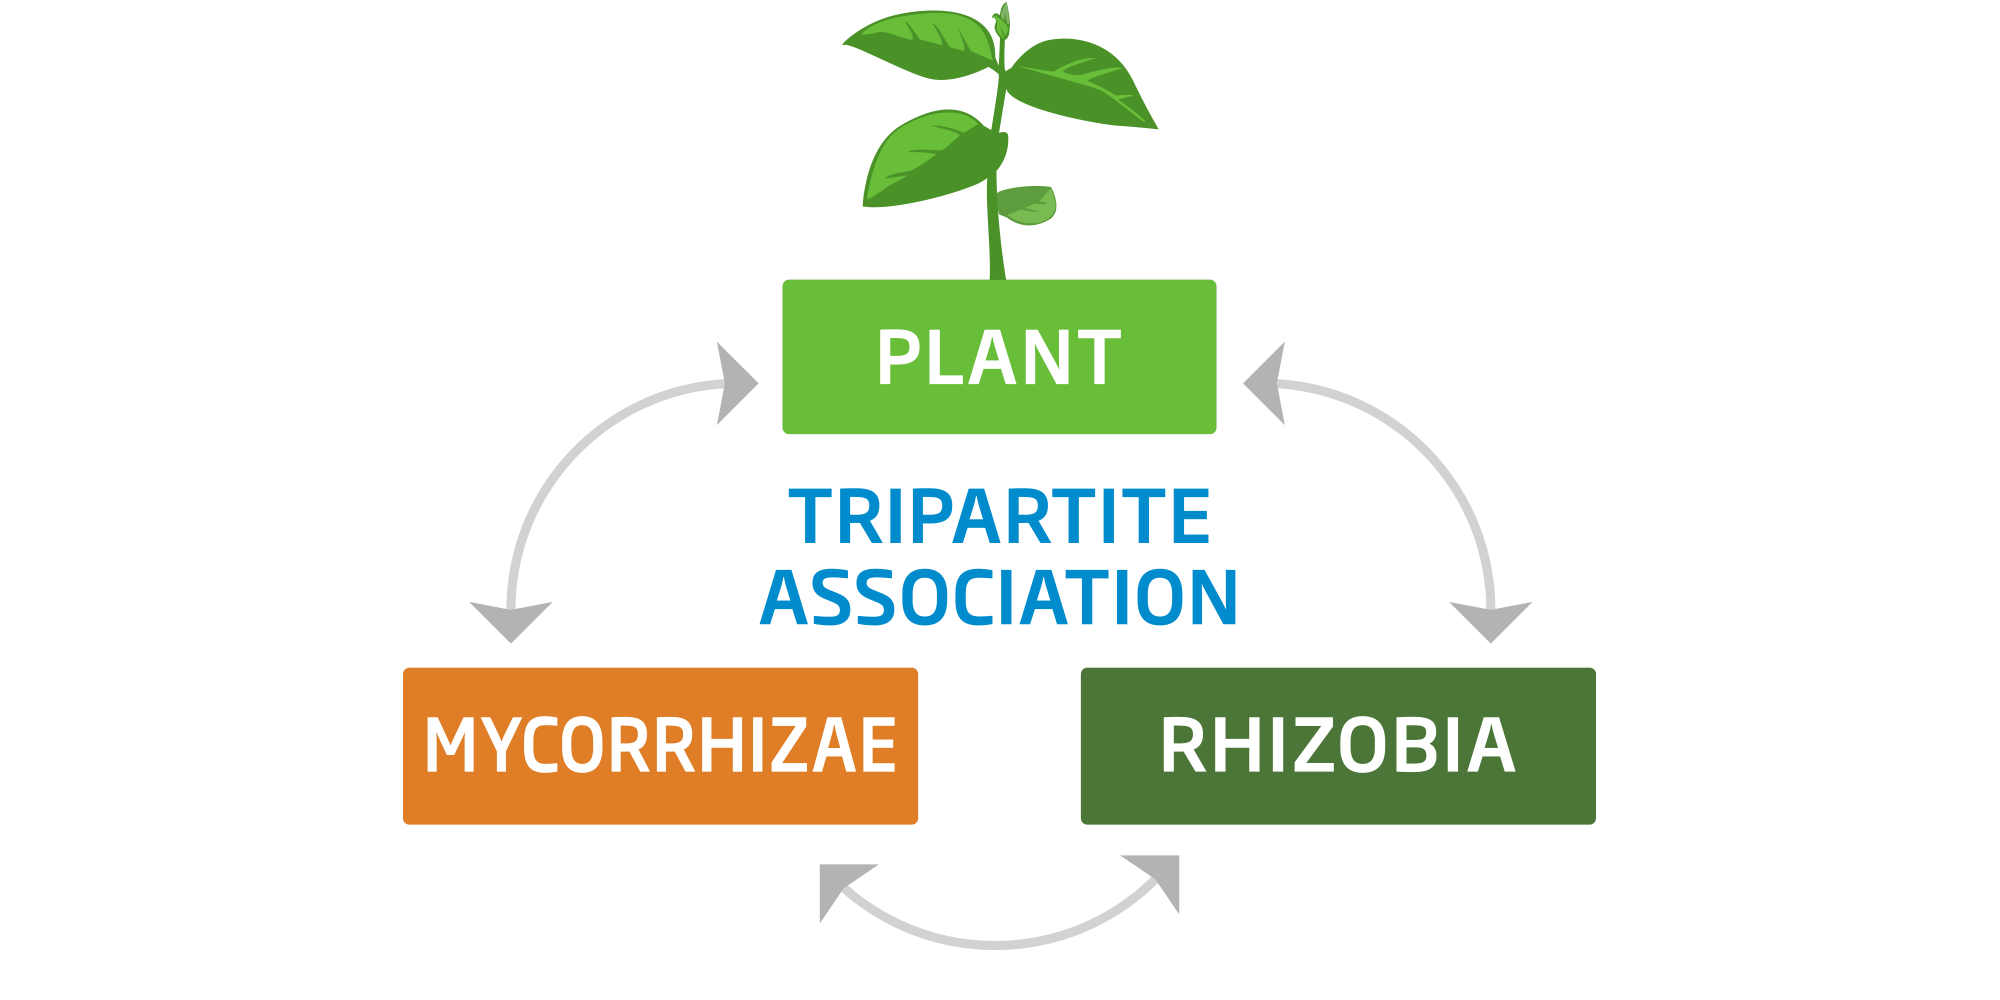 symbiosis nitrogen fixation andmycorrhizae Interactions between nitrogen fixation, mycorrhizal colonization, and host-plant growth in the phaseolus-rhizobium-glomus symbiosis.